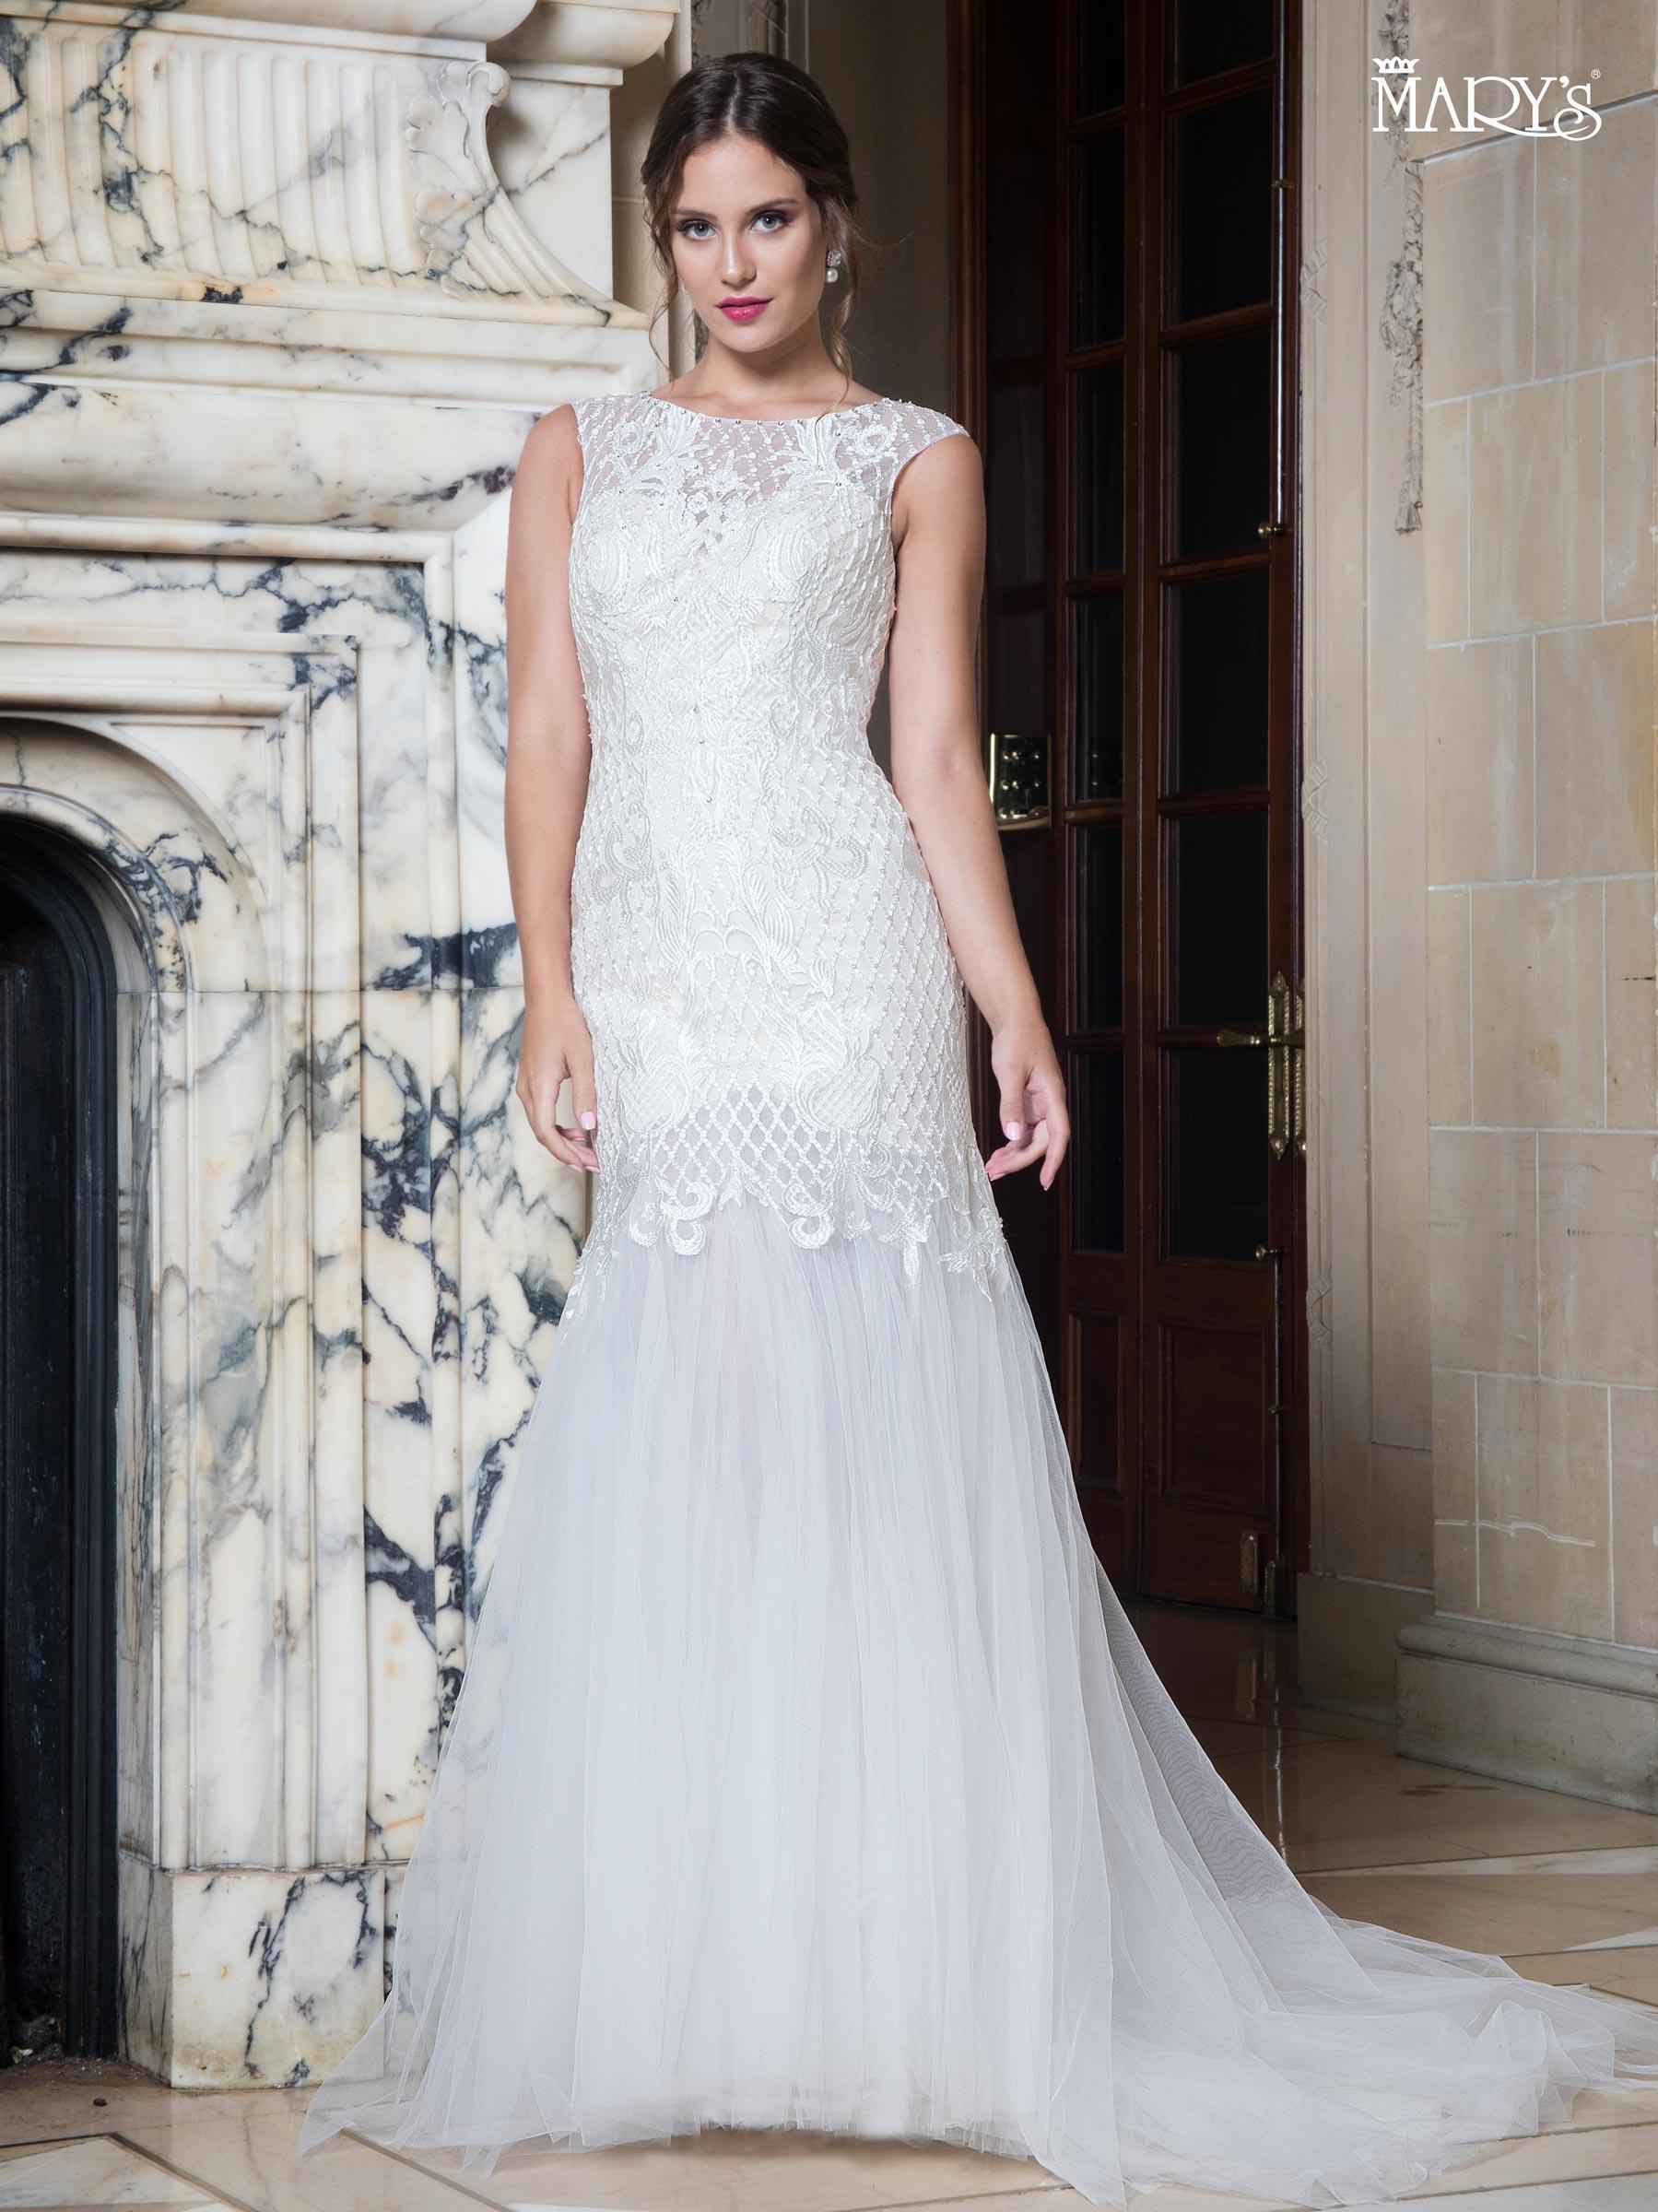 Bridal Wedding Dresses | Mary's | Style - MB3015